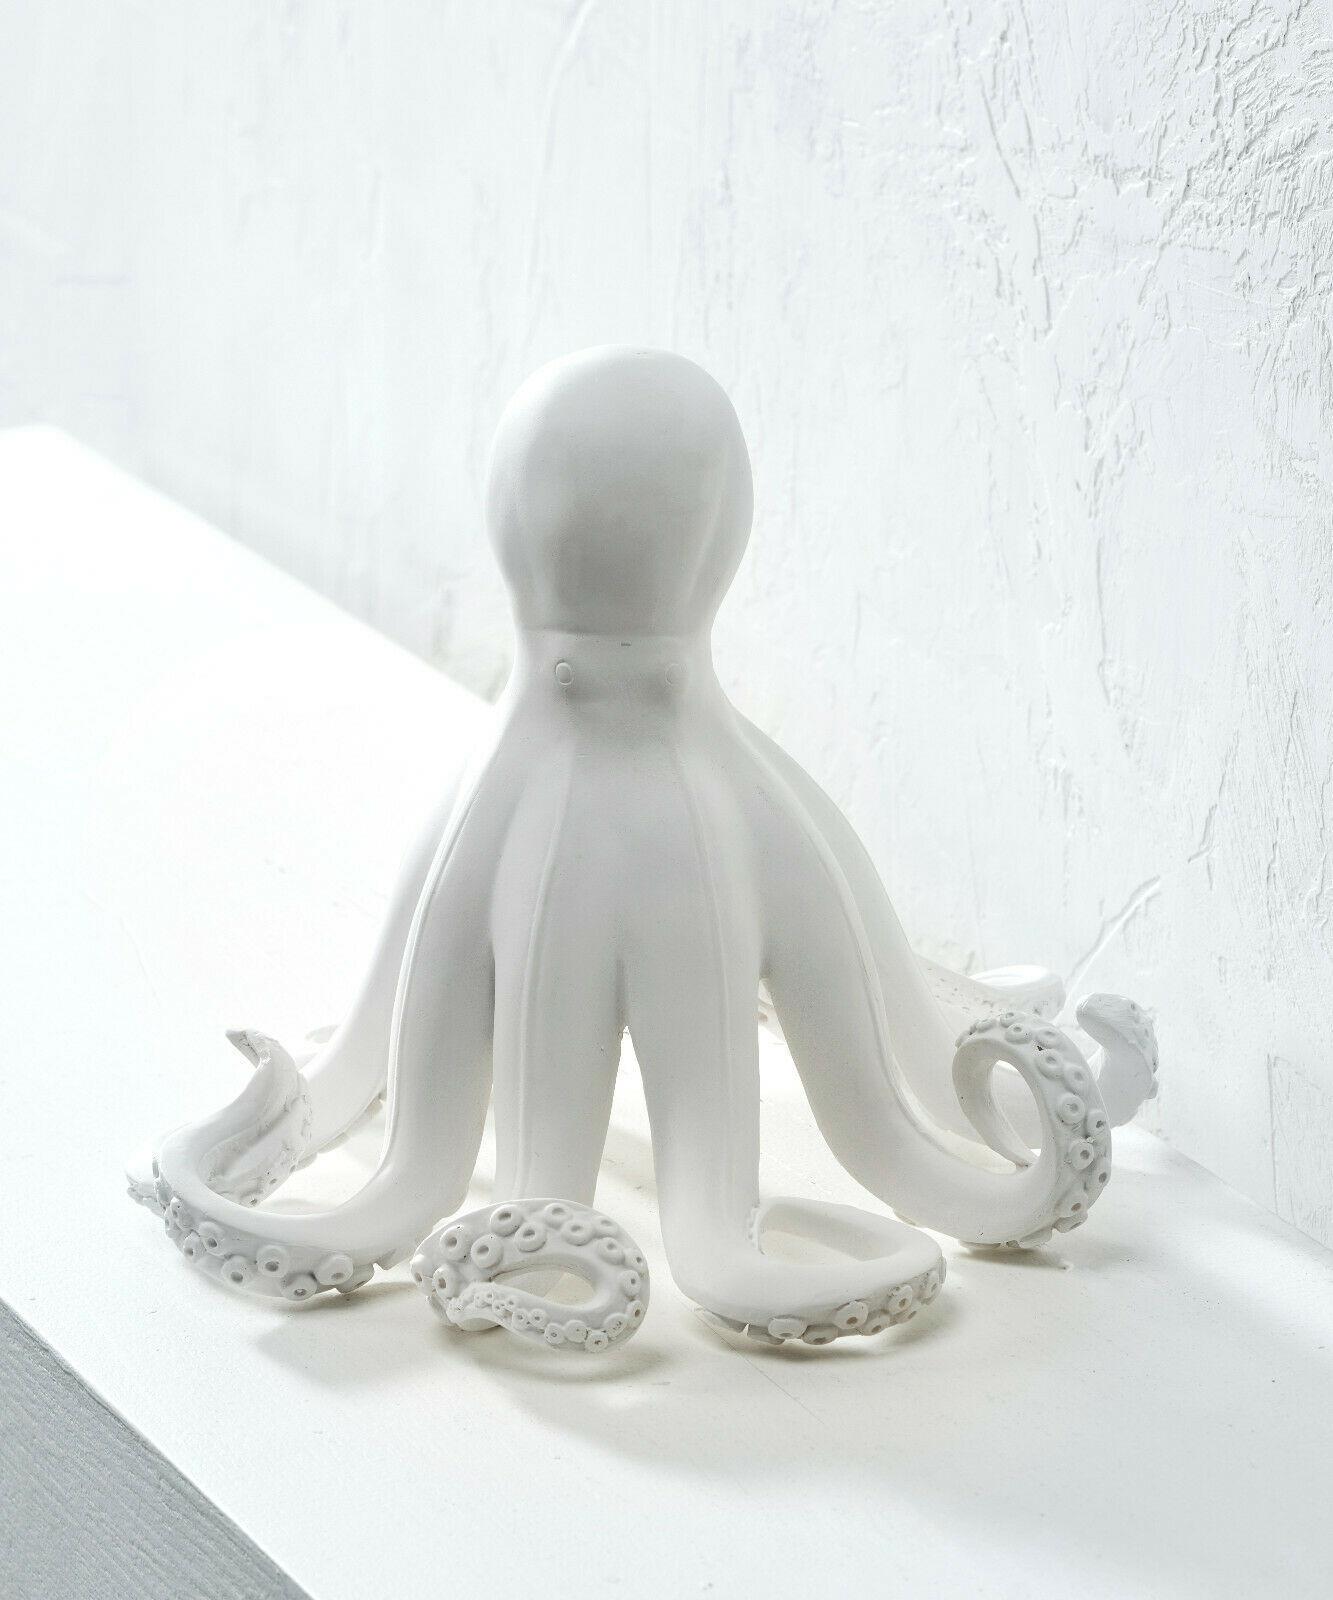 "8.2"" high White Octopus Nautical Figurine Polystone"